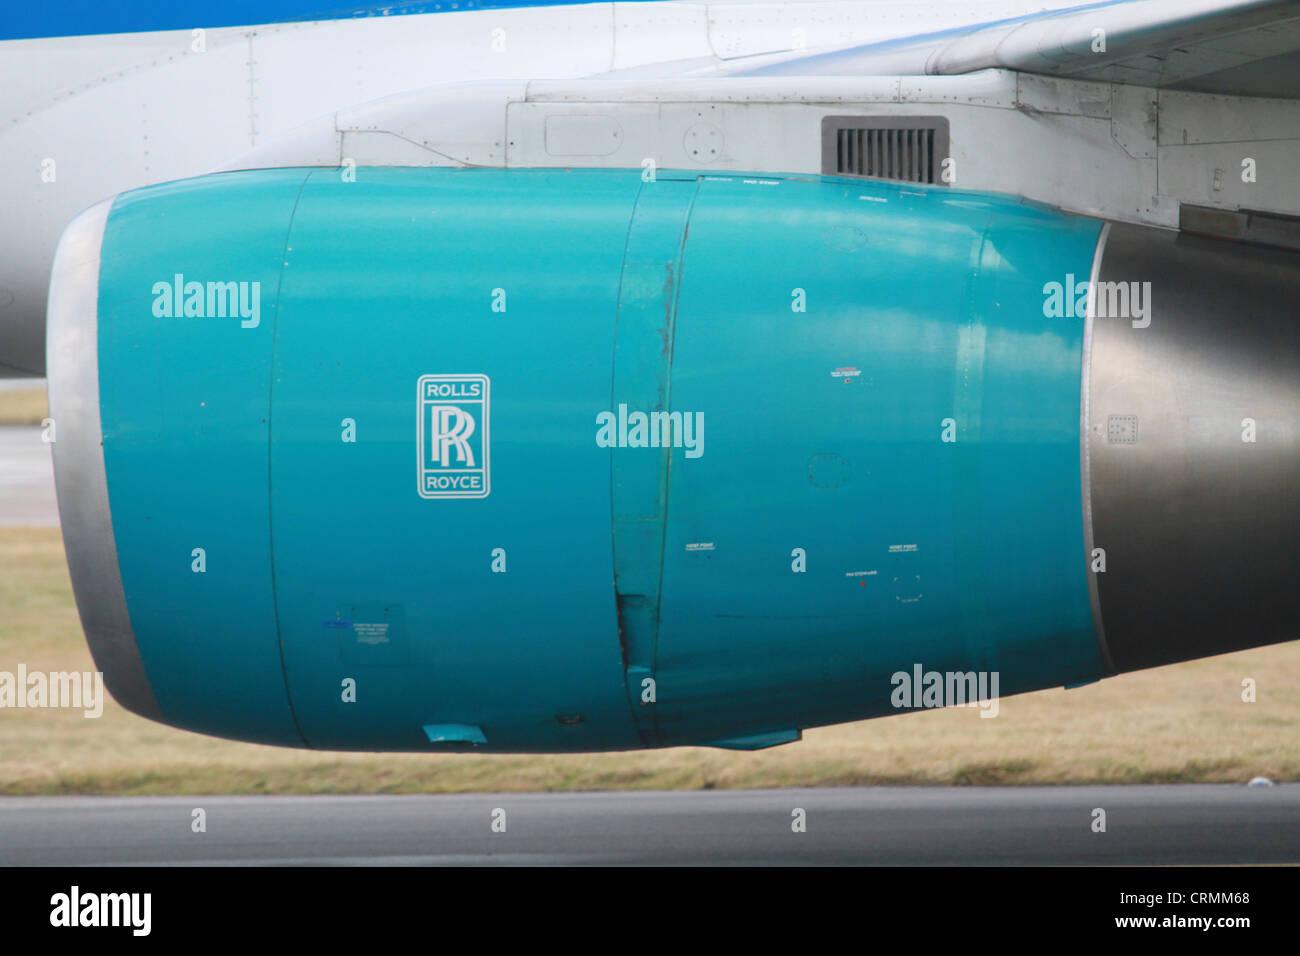 Rolls Royce aircraft jet engine - Stock Image